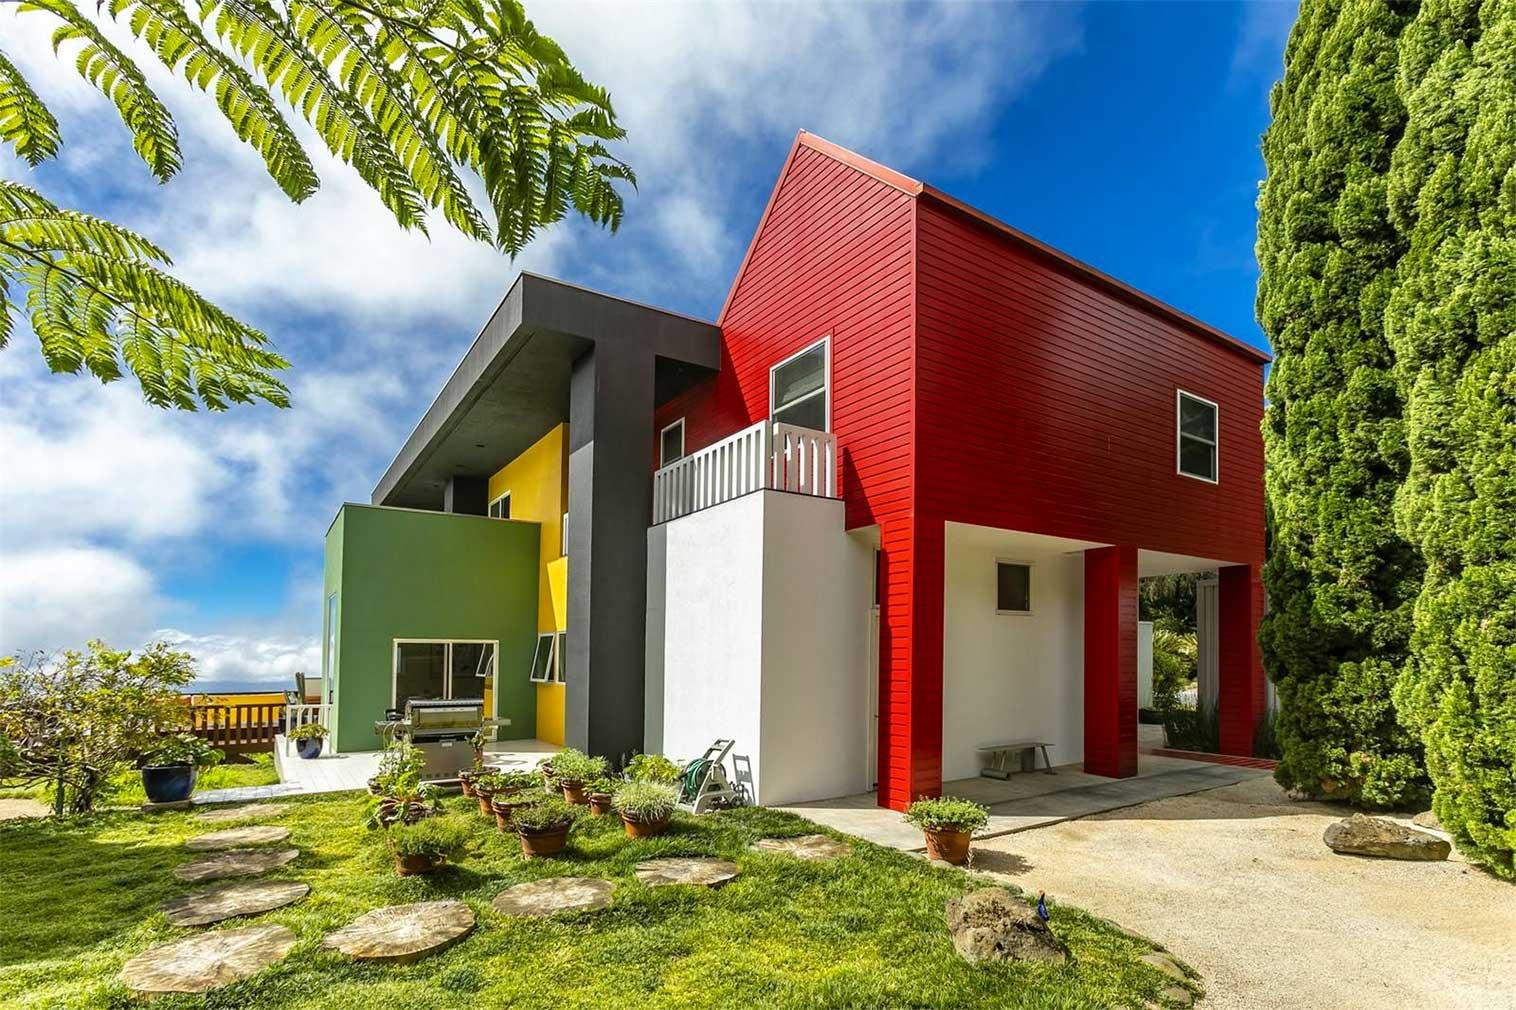 Ettore Sottsass' Casa Olabuenaga in Hawaii